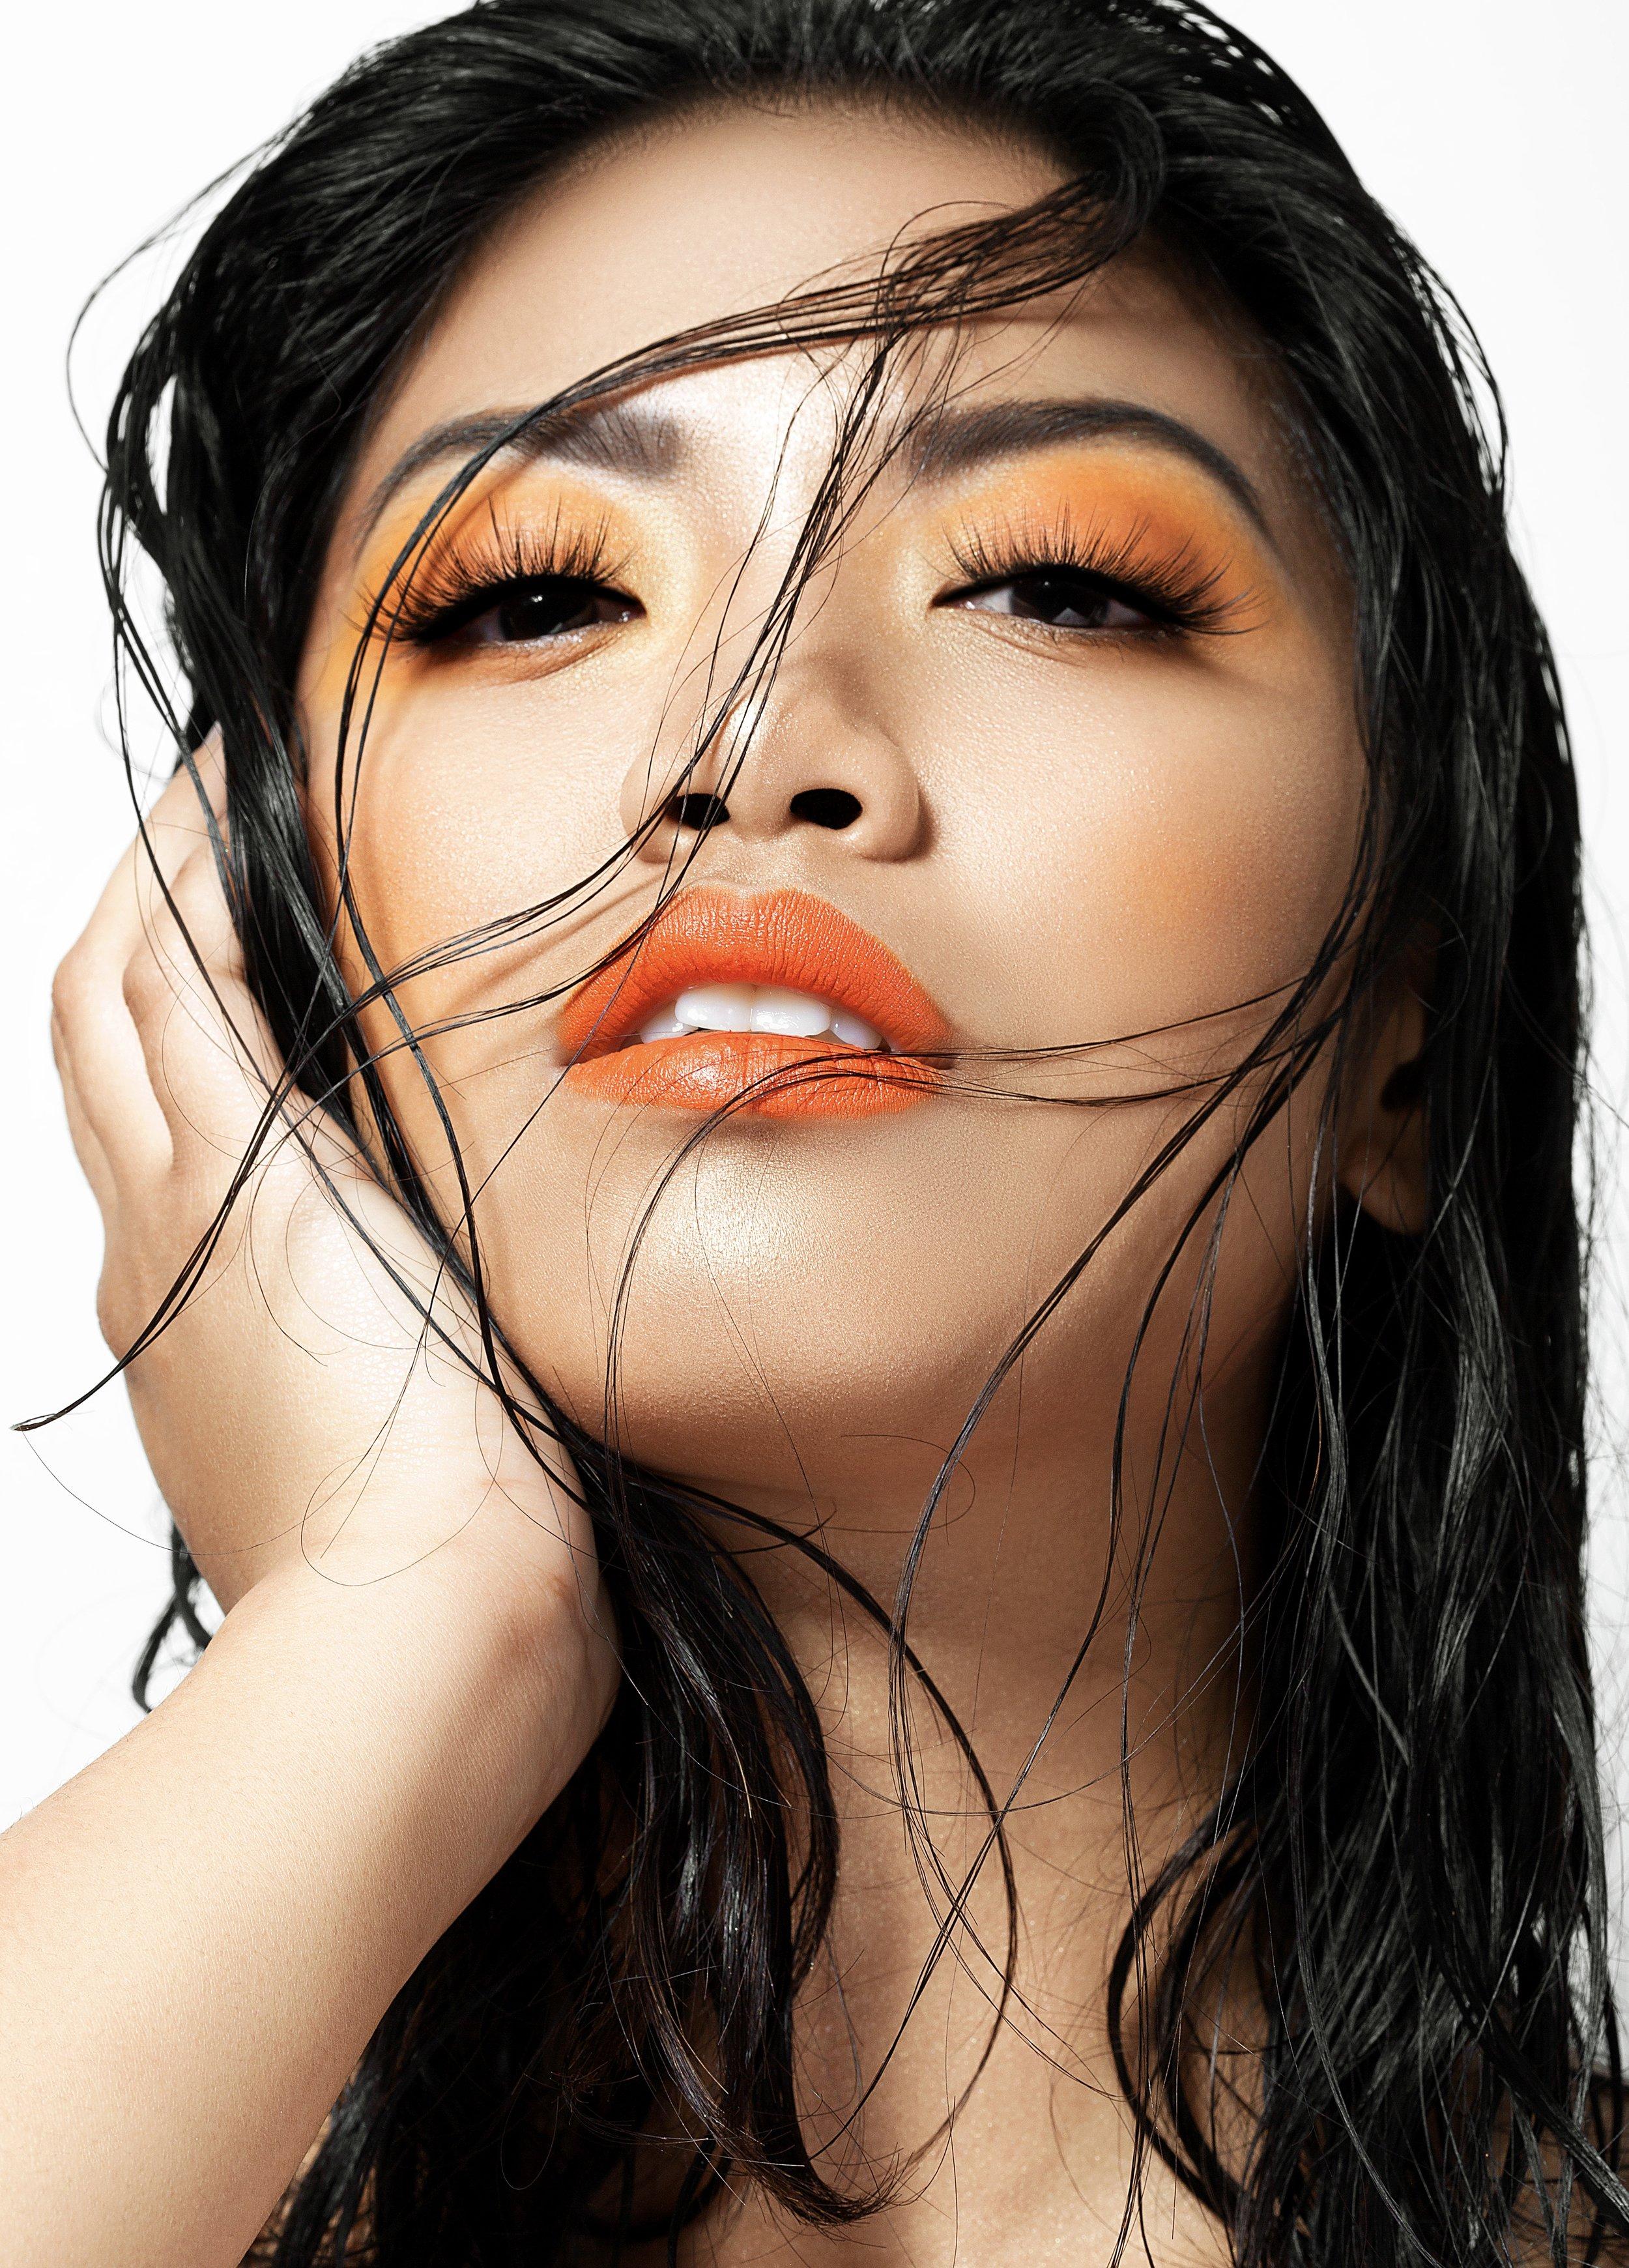 Photographer: @jachristo   Makeup: @dashametz_makeup & @lbartistry   Models: @draculina91 , @goddessbaybay , @layyglow , @piaiscool & @spookyghostdad   Text: @im_kelpsea